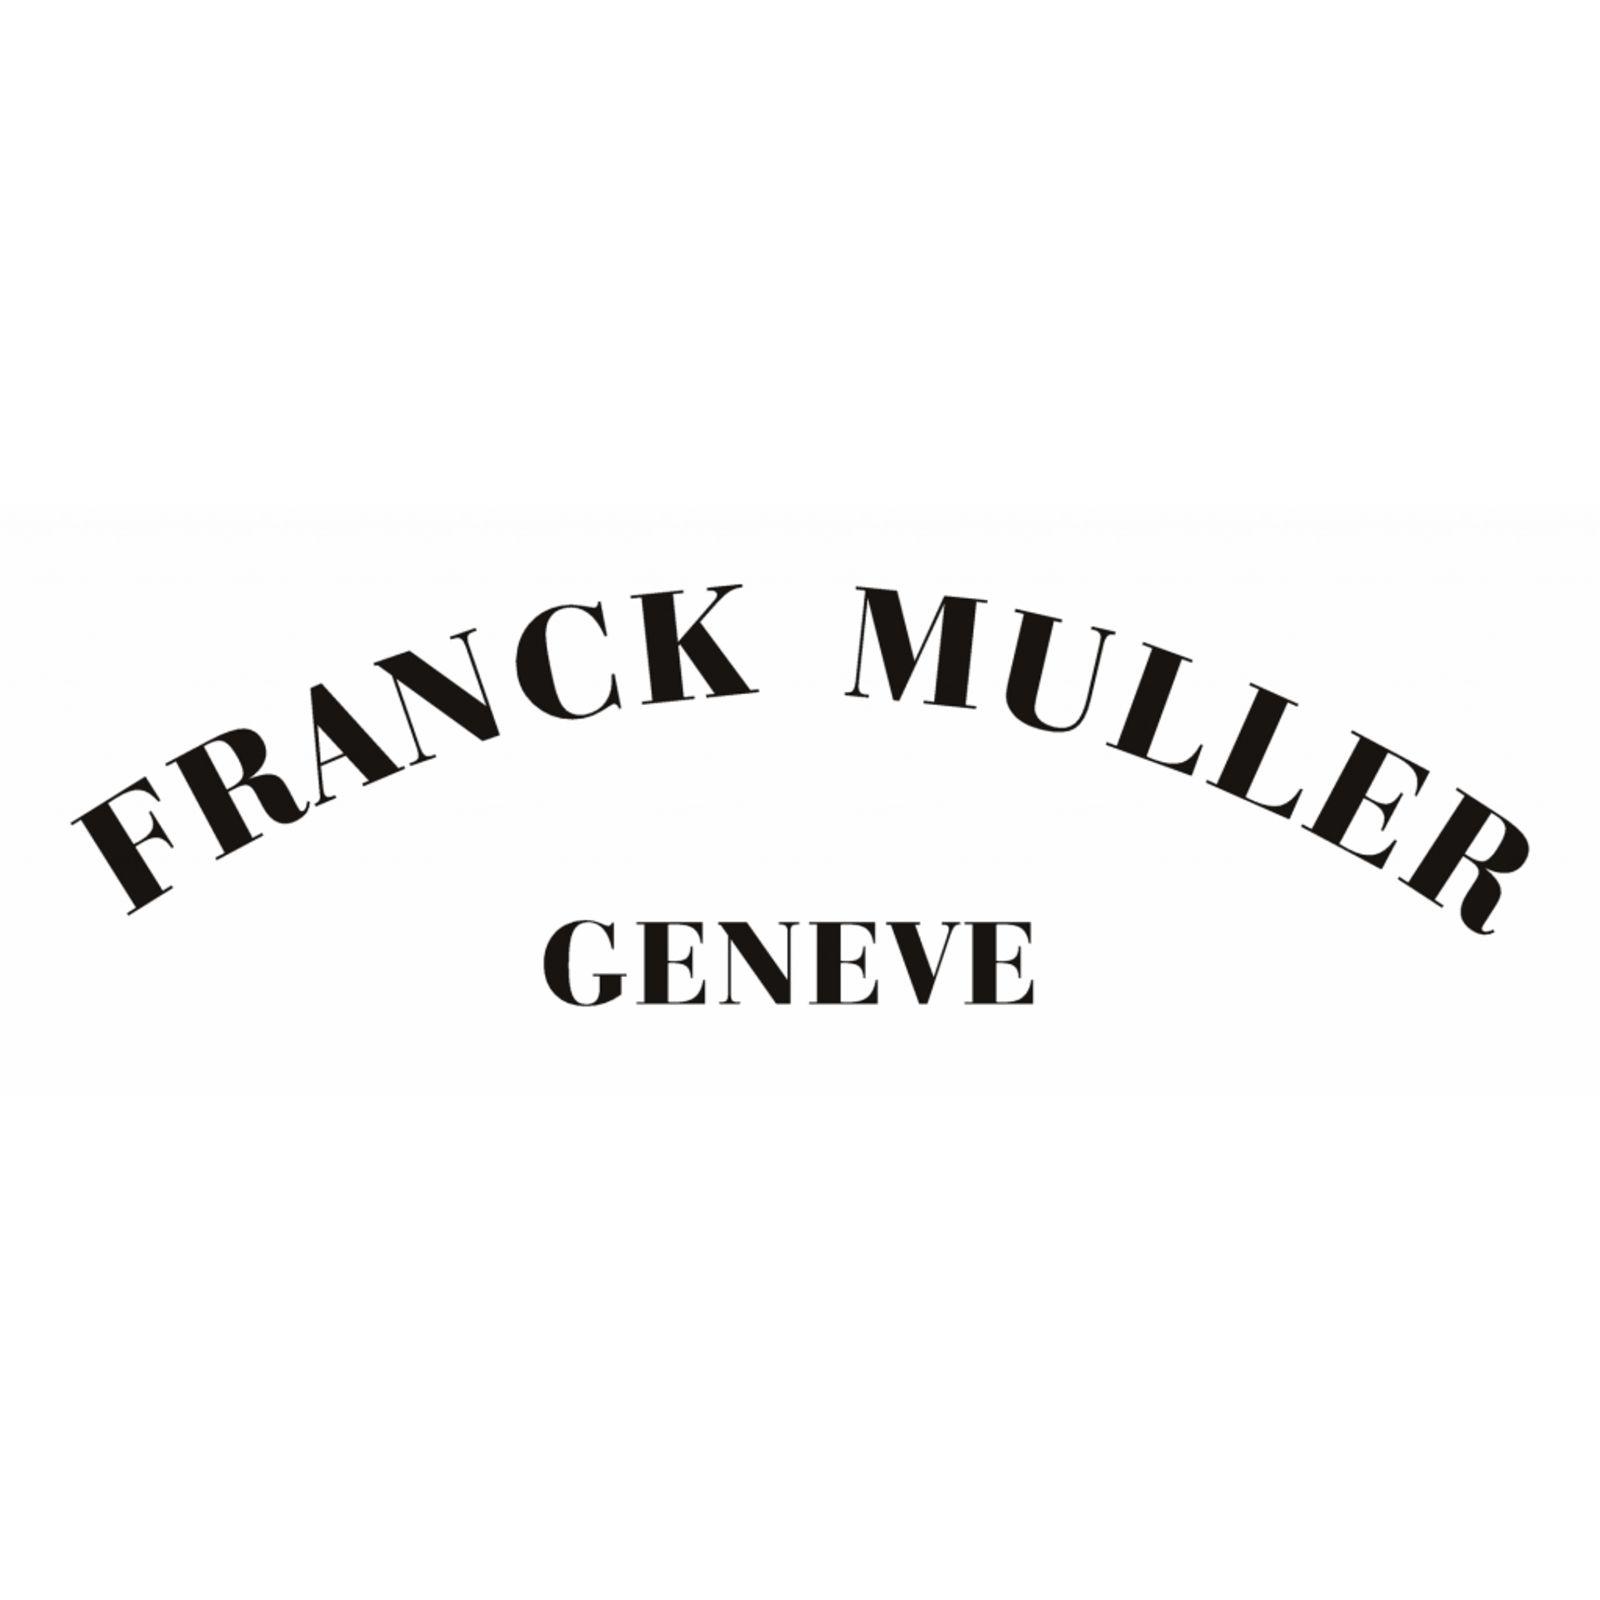 FRANCK MULLER (Bild 1)